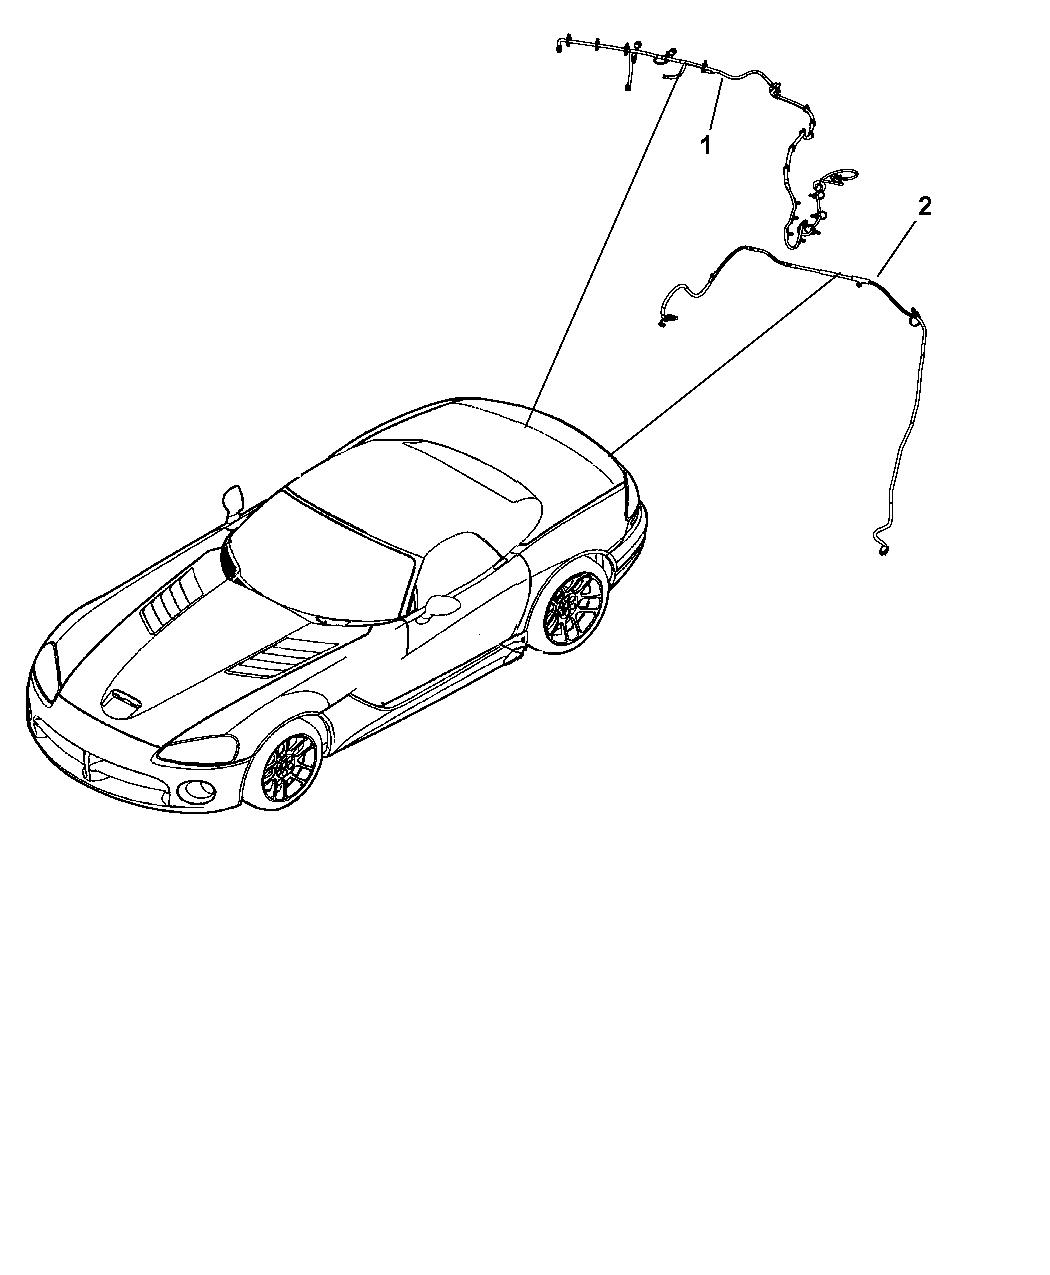 2008 Dodge Viper Wiring Door, Deck Lid, And Liftgate